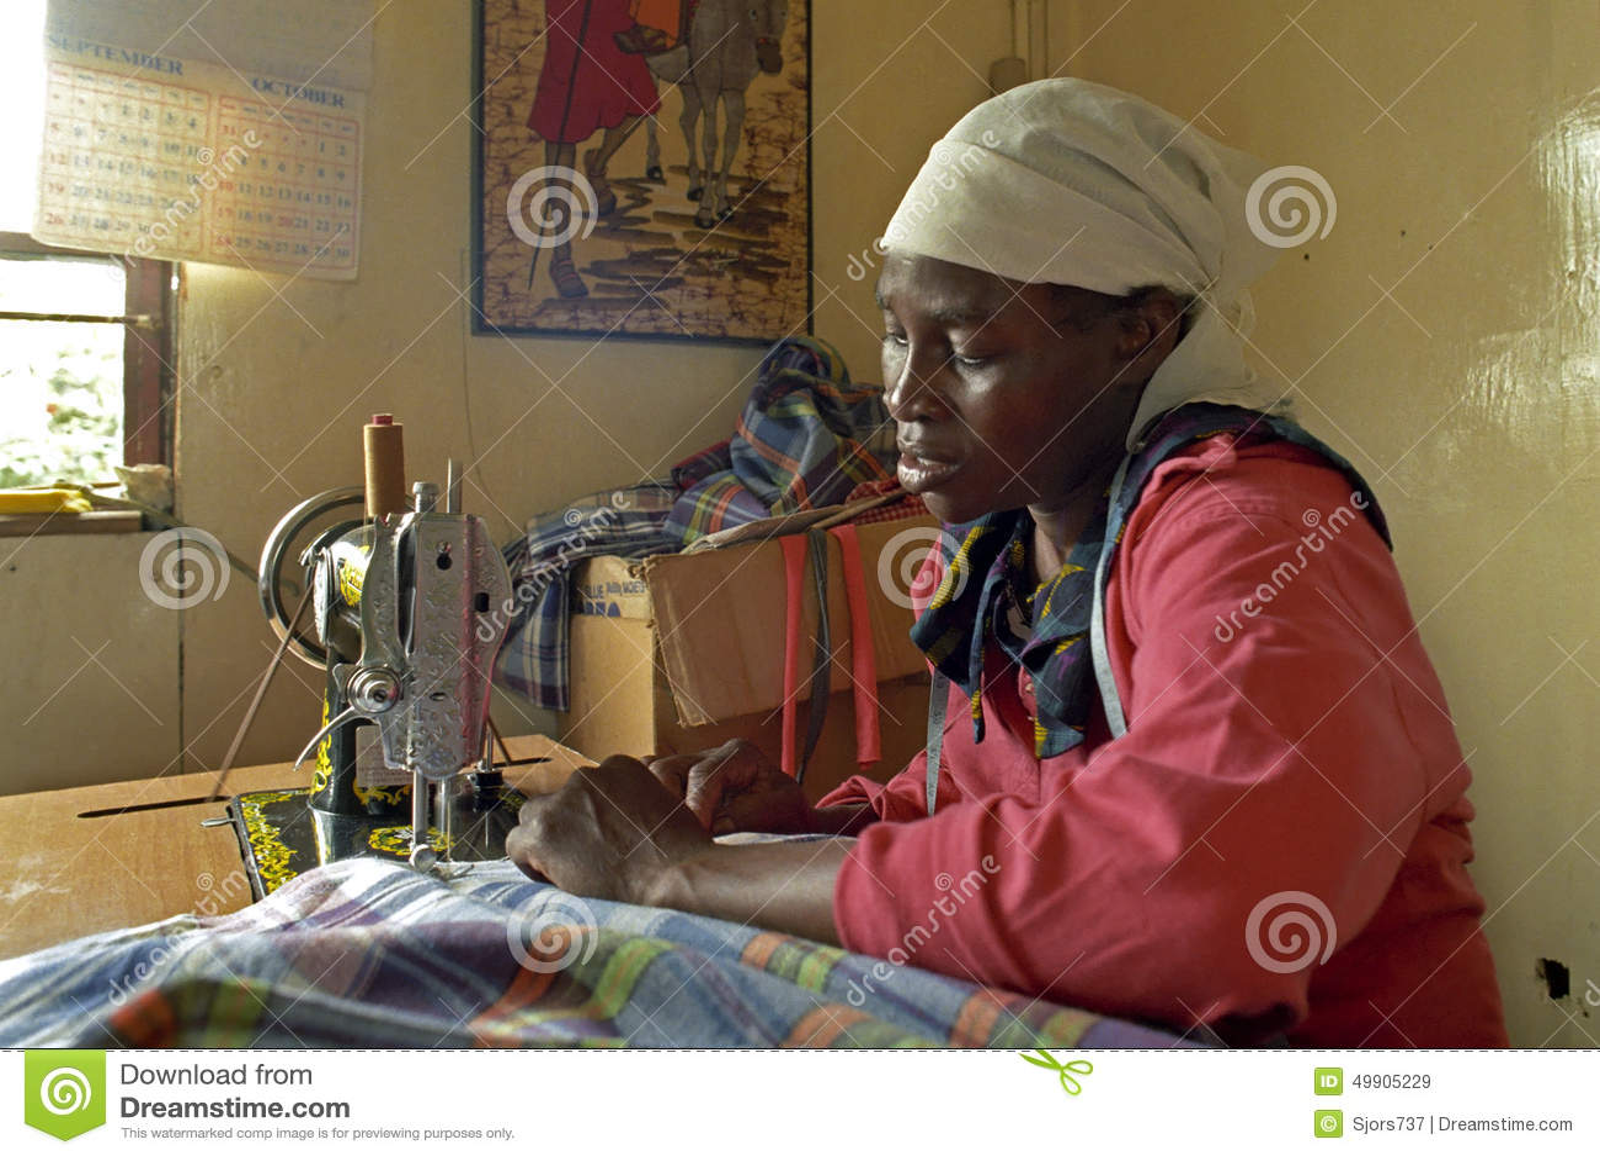 Portrait of working Kenyan woman in sewing room